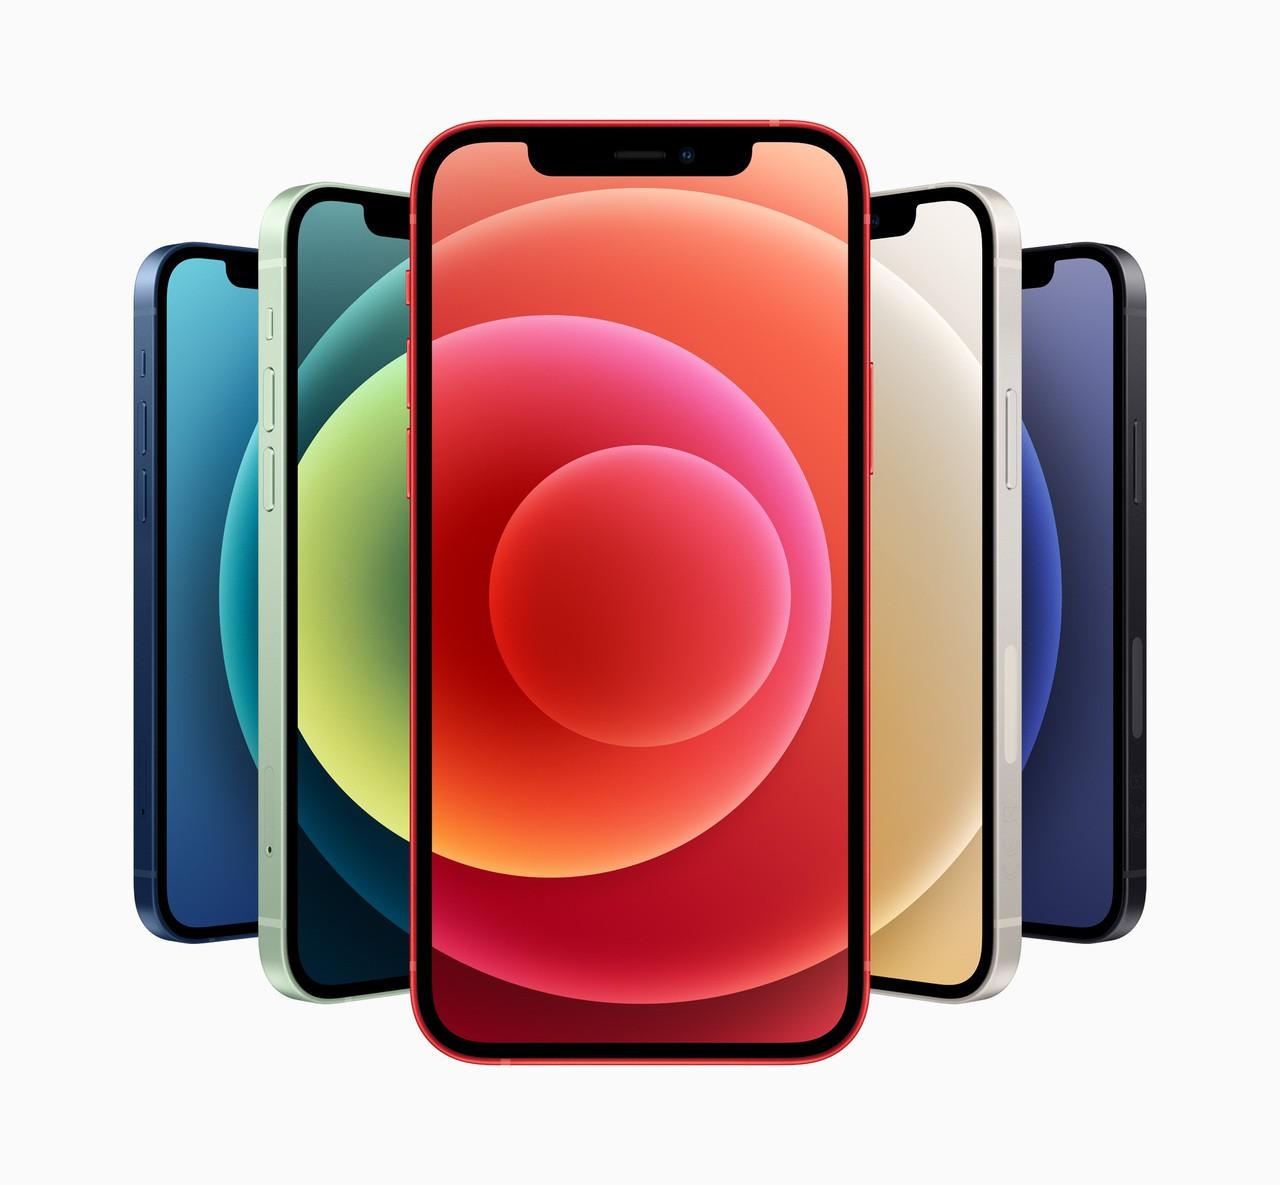 Apple iphone 12 new design 10132020